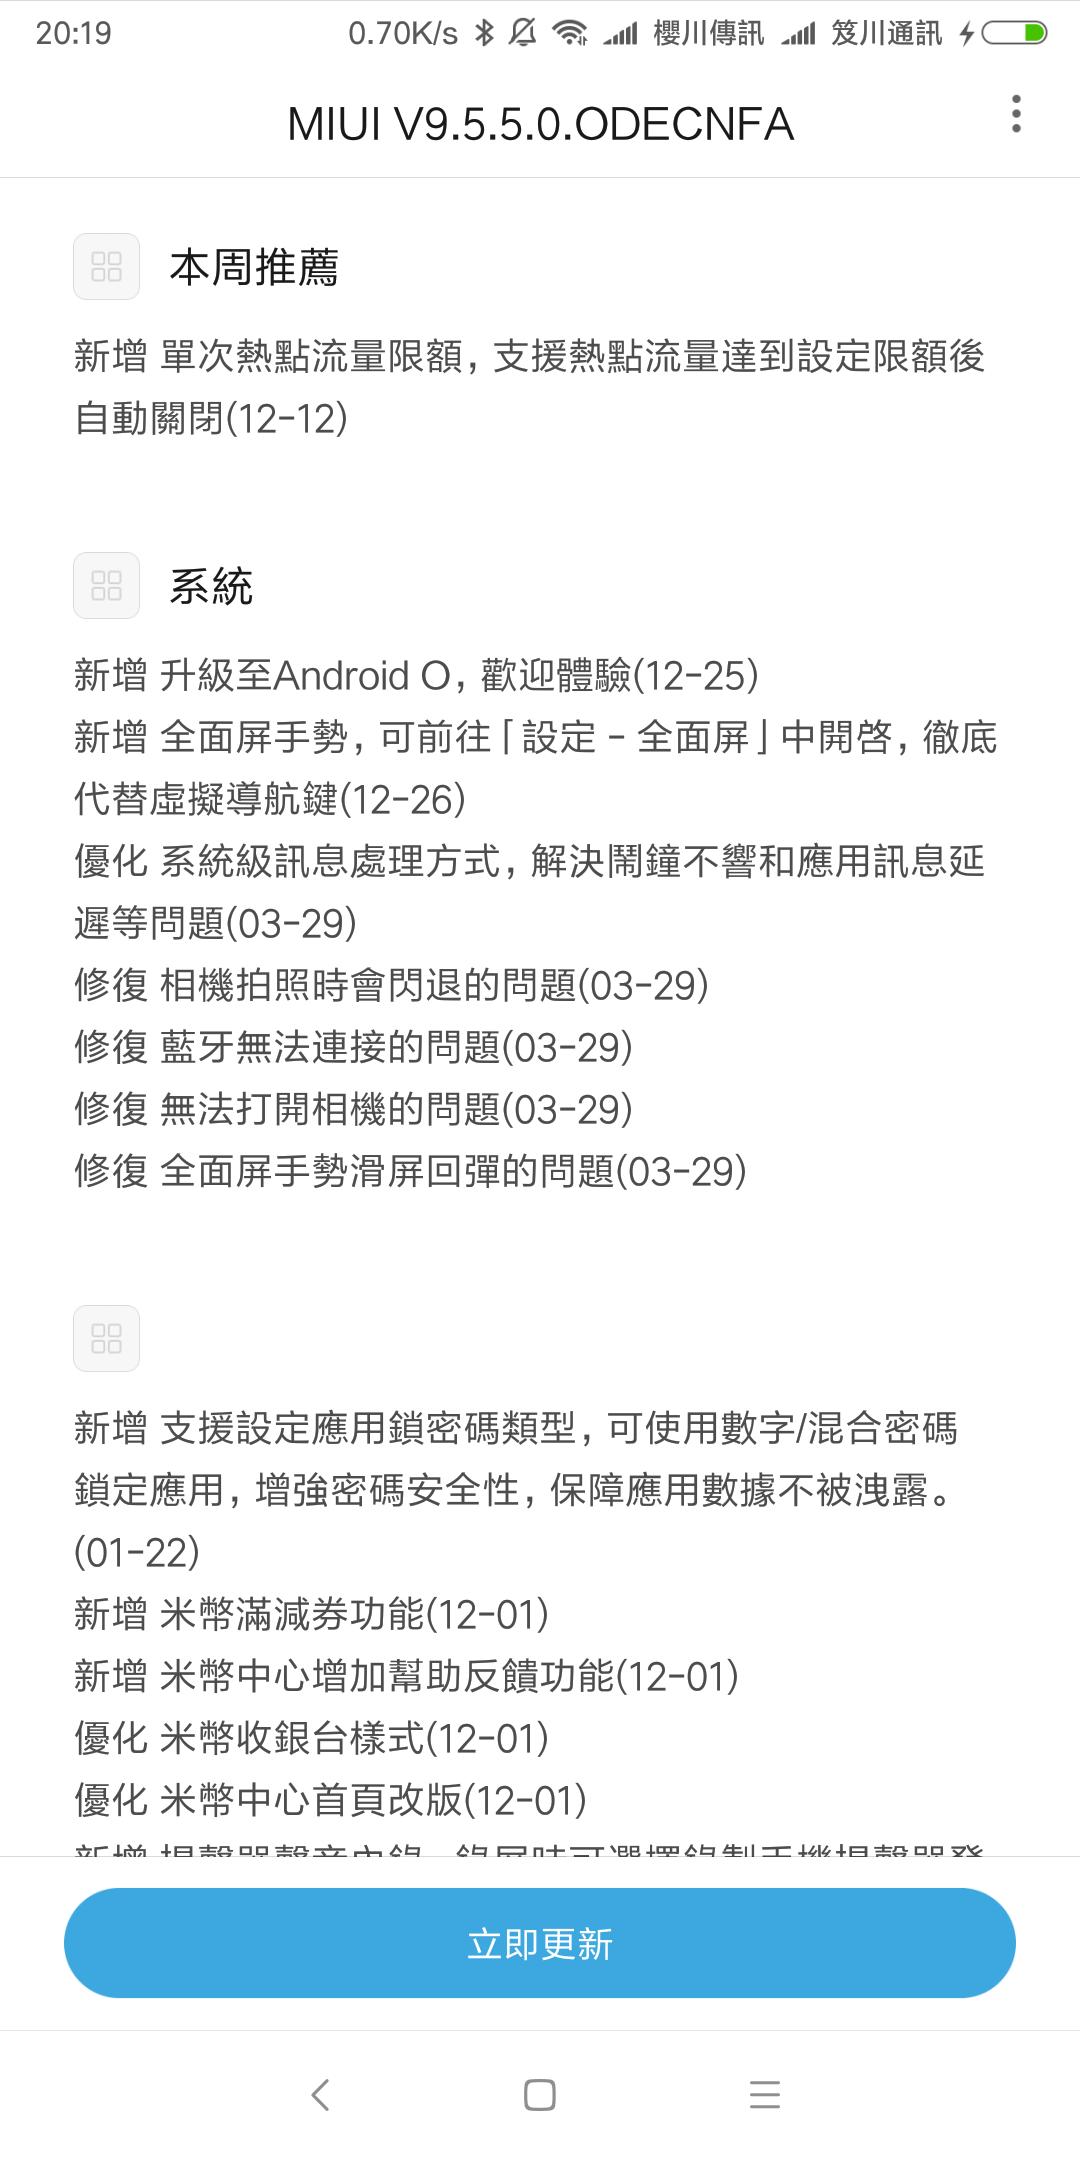 Screenshot_2018-04-12-20-19-51-854_com.android.updater